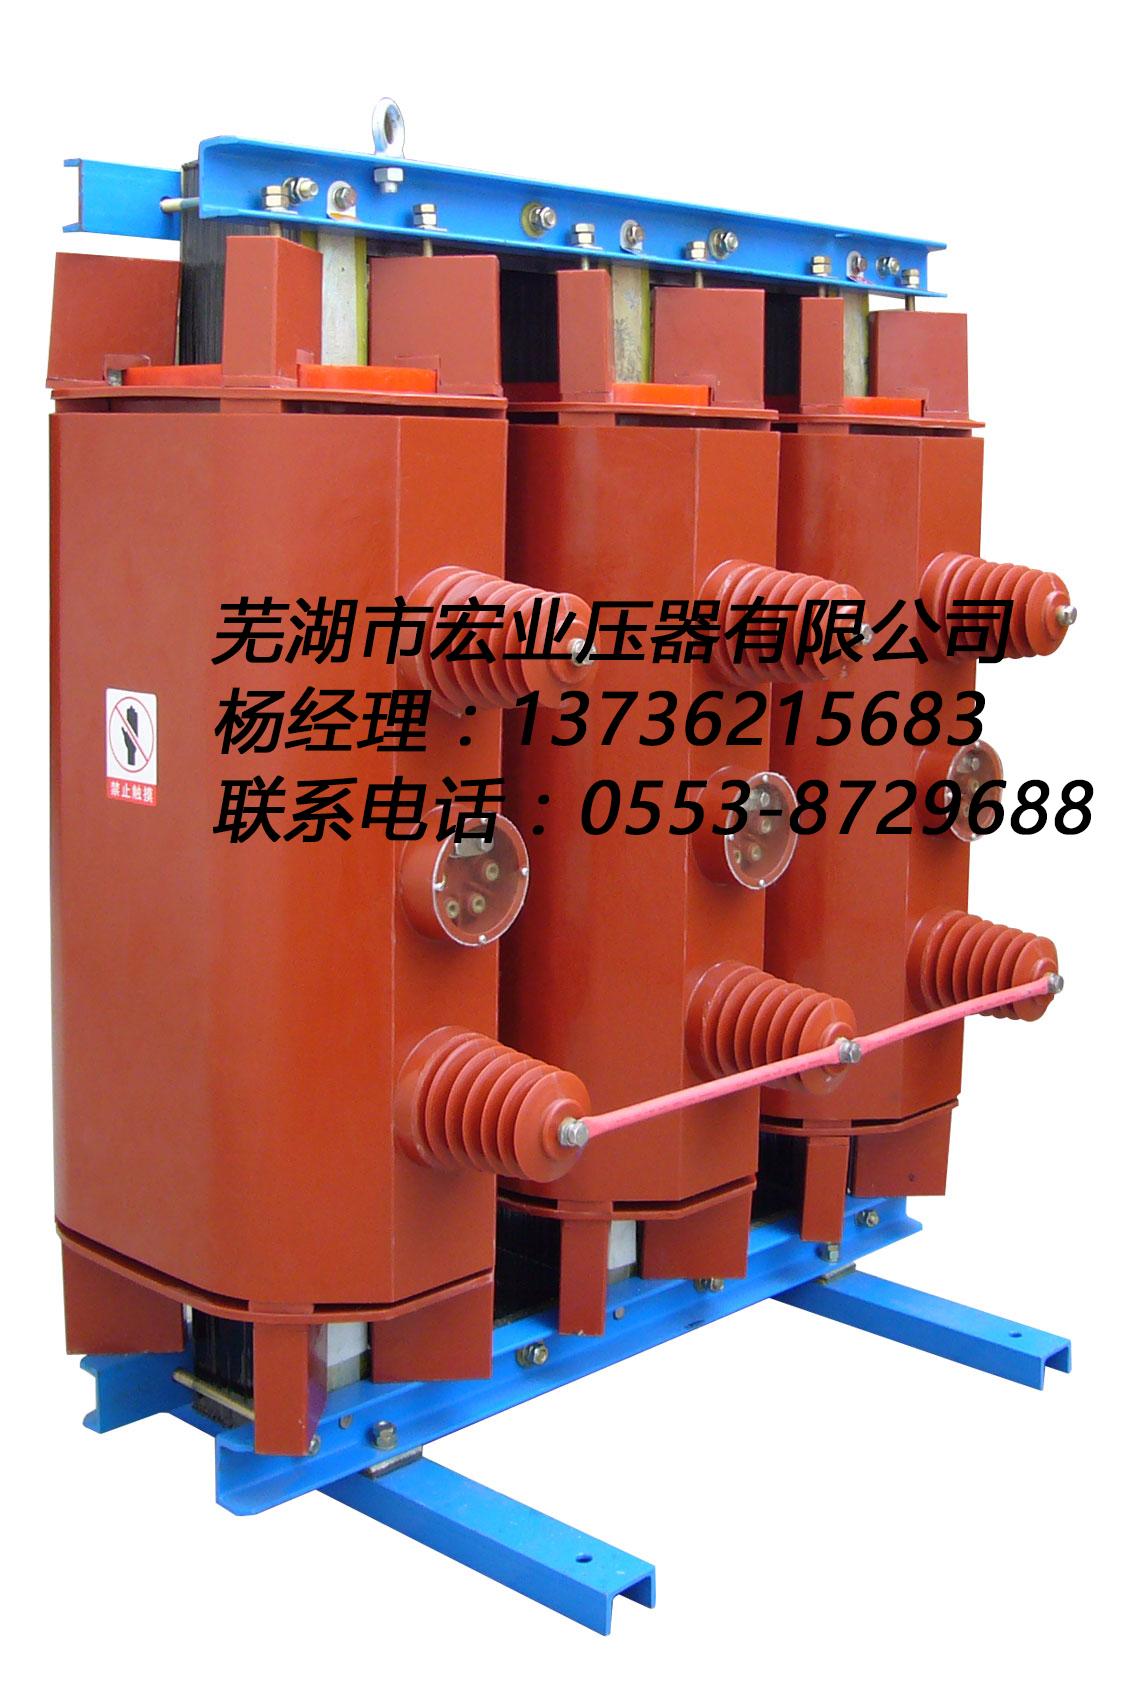 SC10-1600/35-0.4环氧树脂浇注干式电力变压器厂家价格